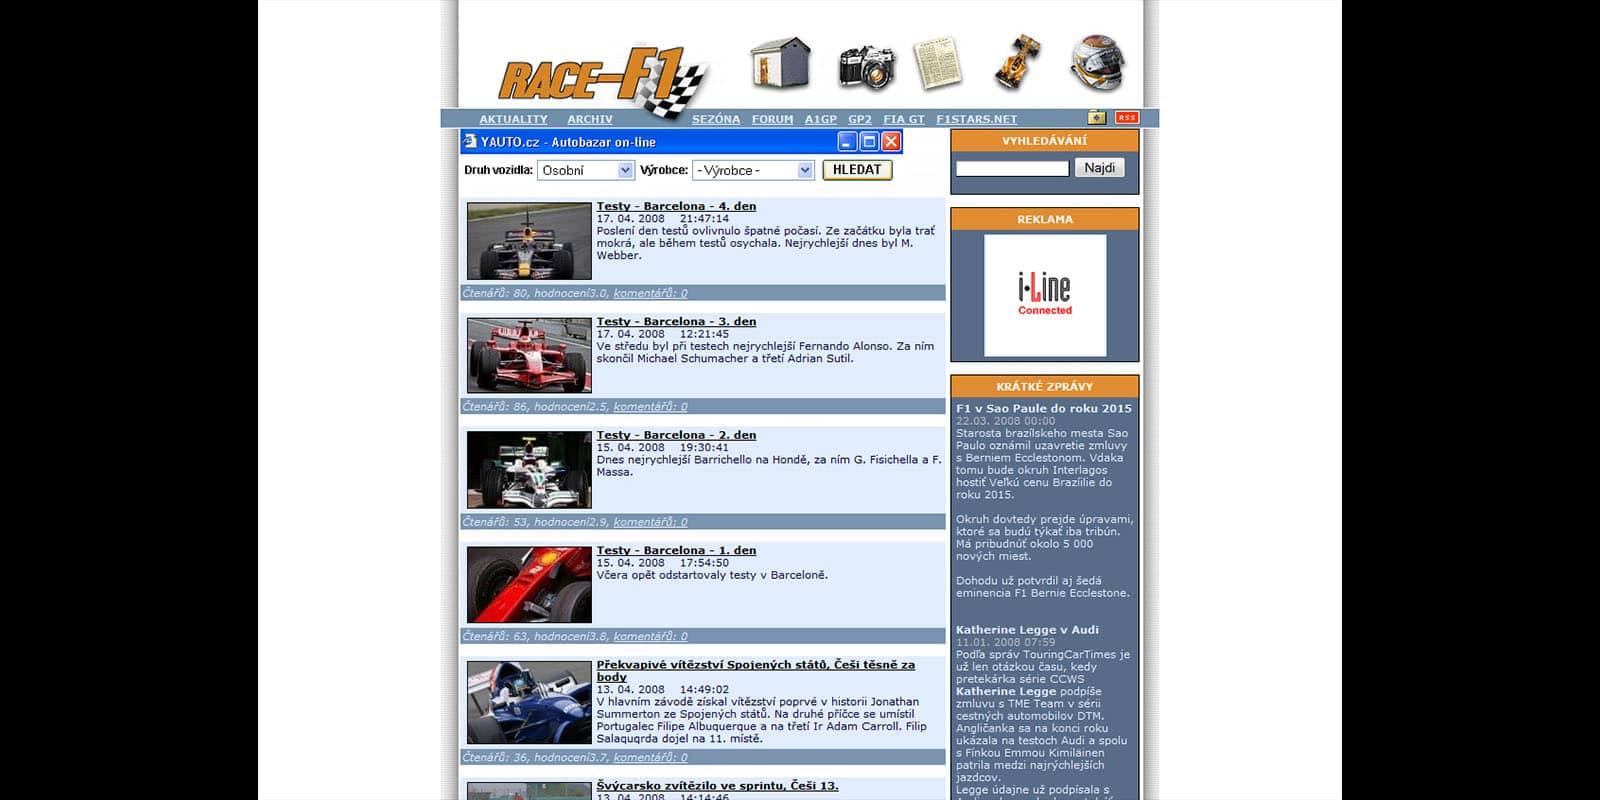 06_race_f1_com